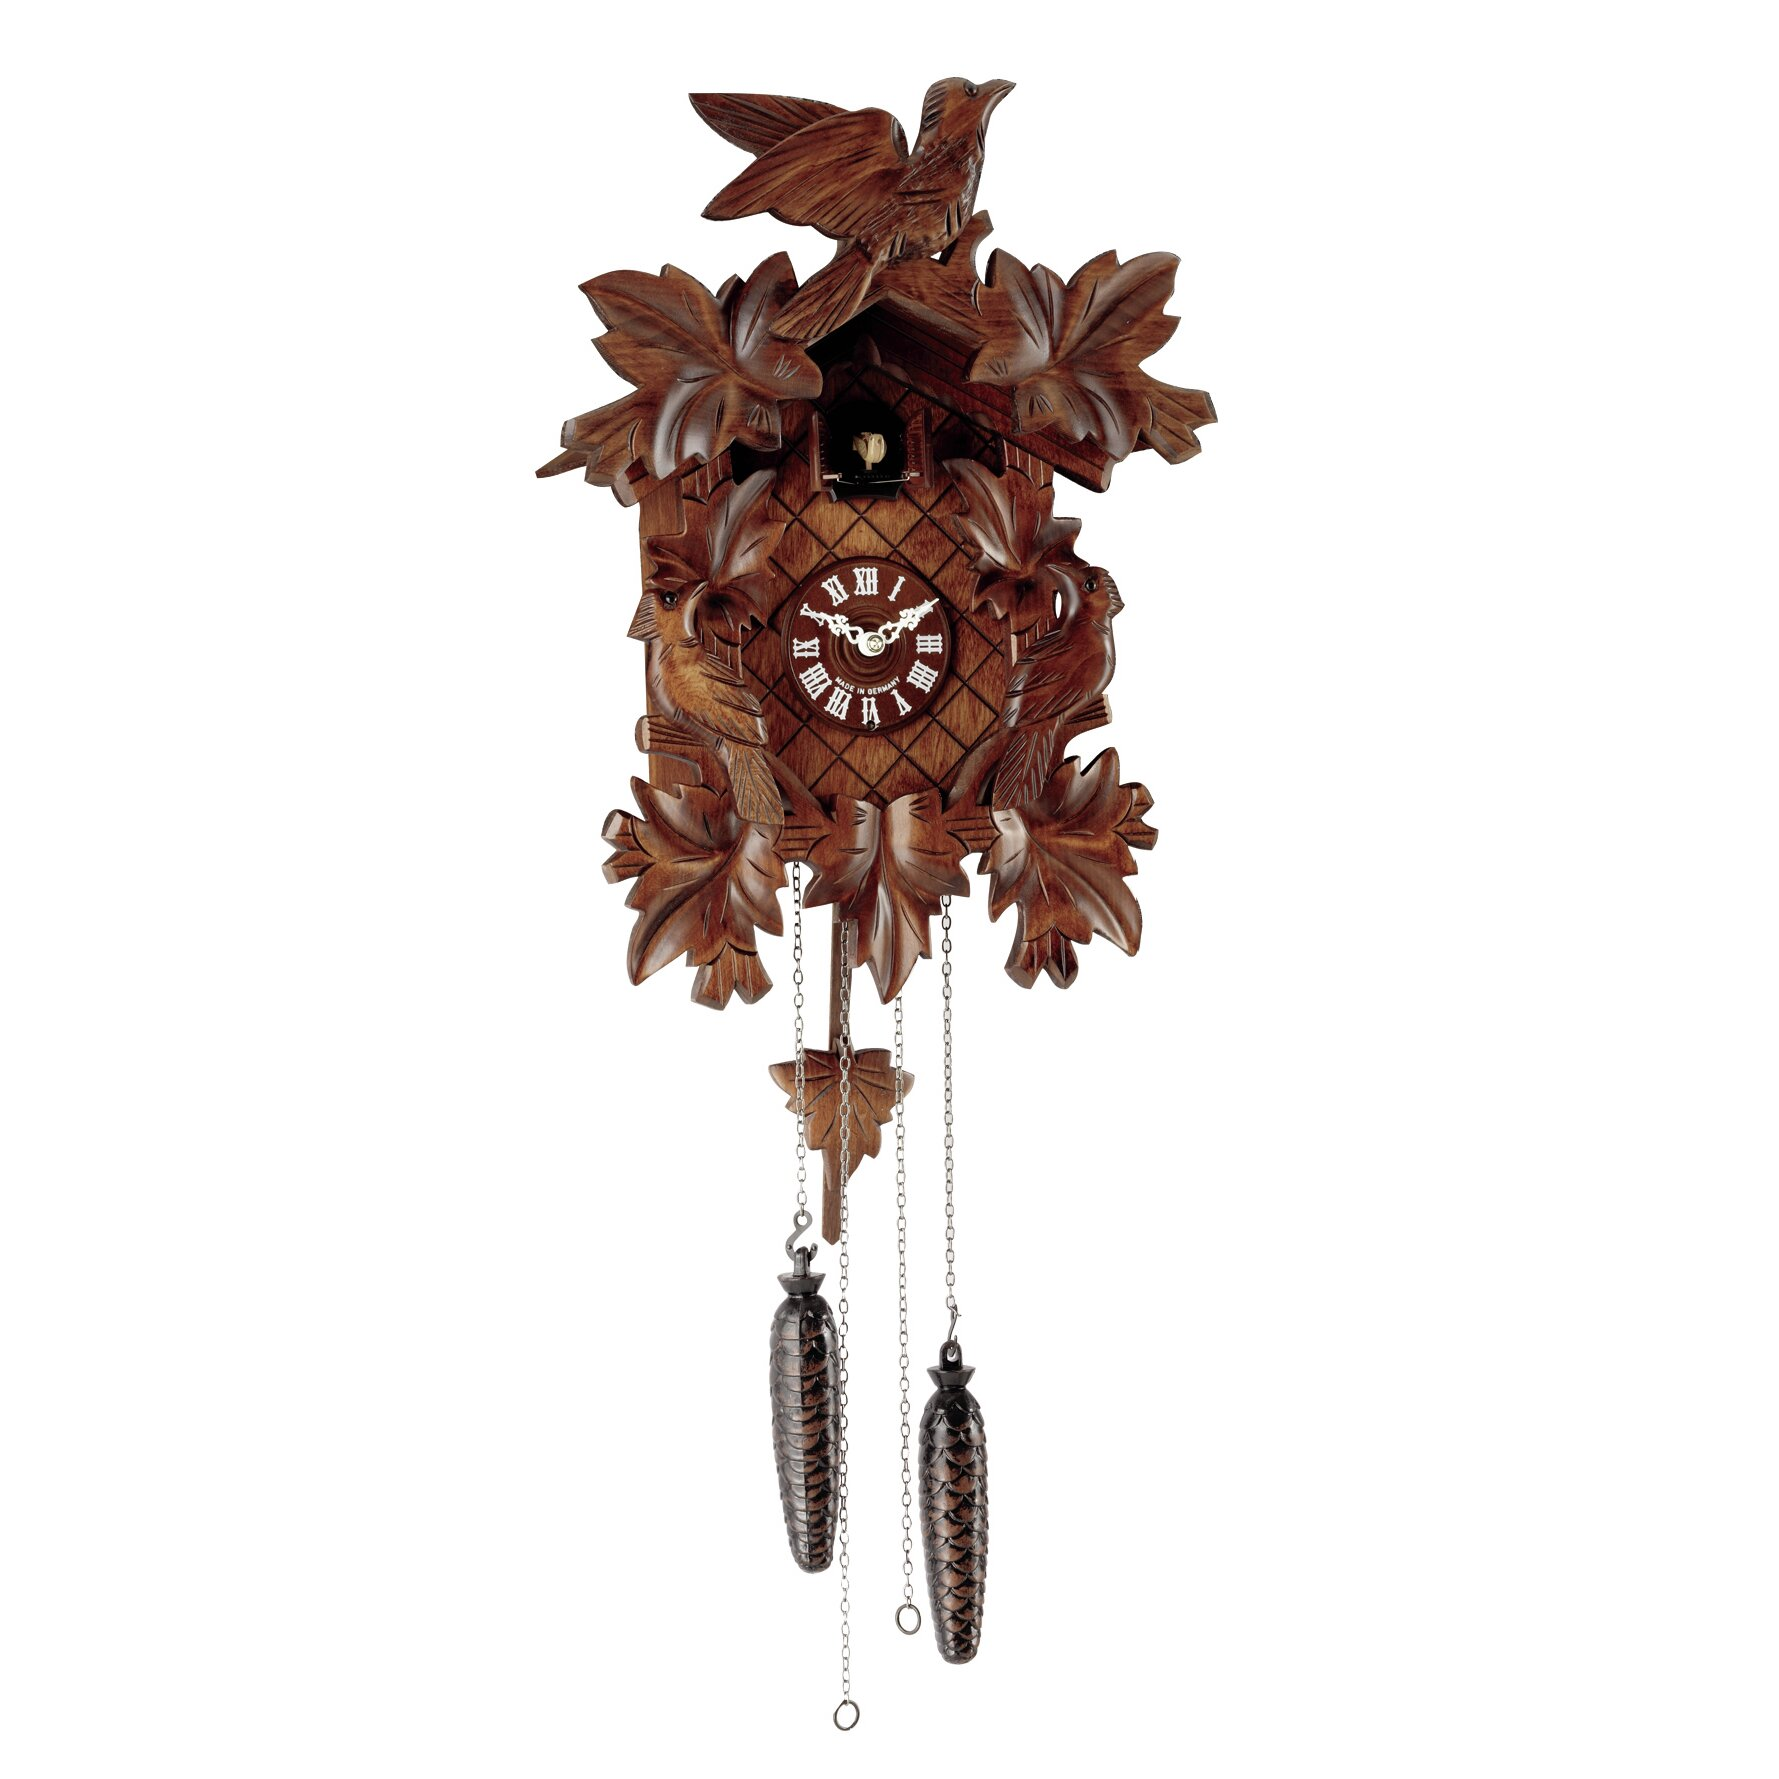 dating black forest clocks Black forest imports,  hubert herr cuckoo clock movements, clock parts, clock repair material, clock repair tools, and black forest cuckoo clocks.